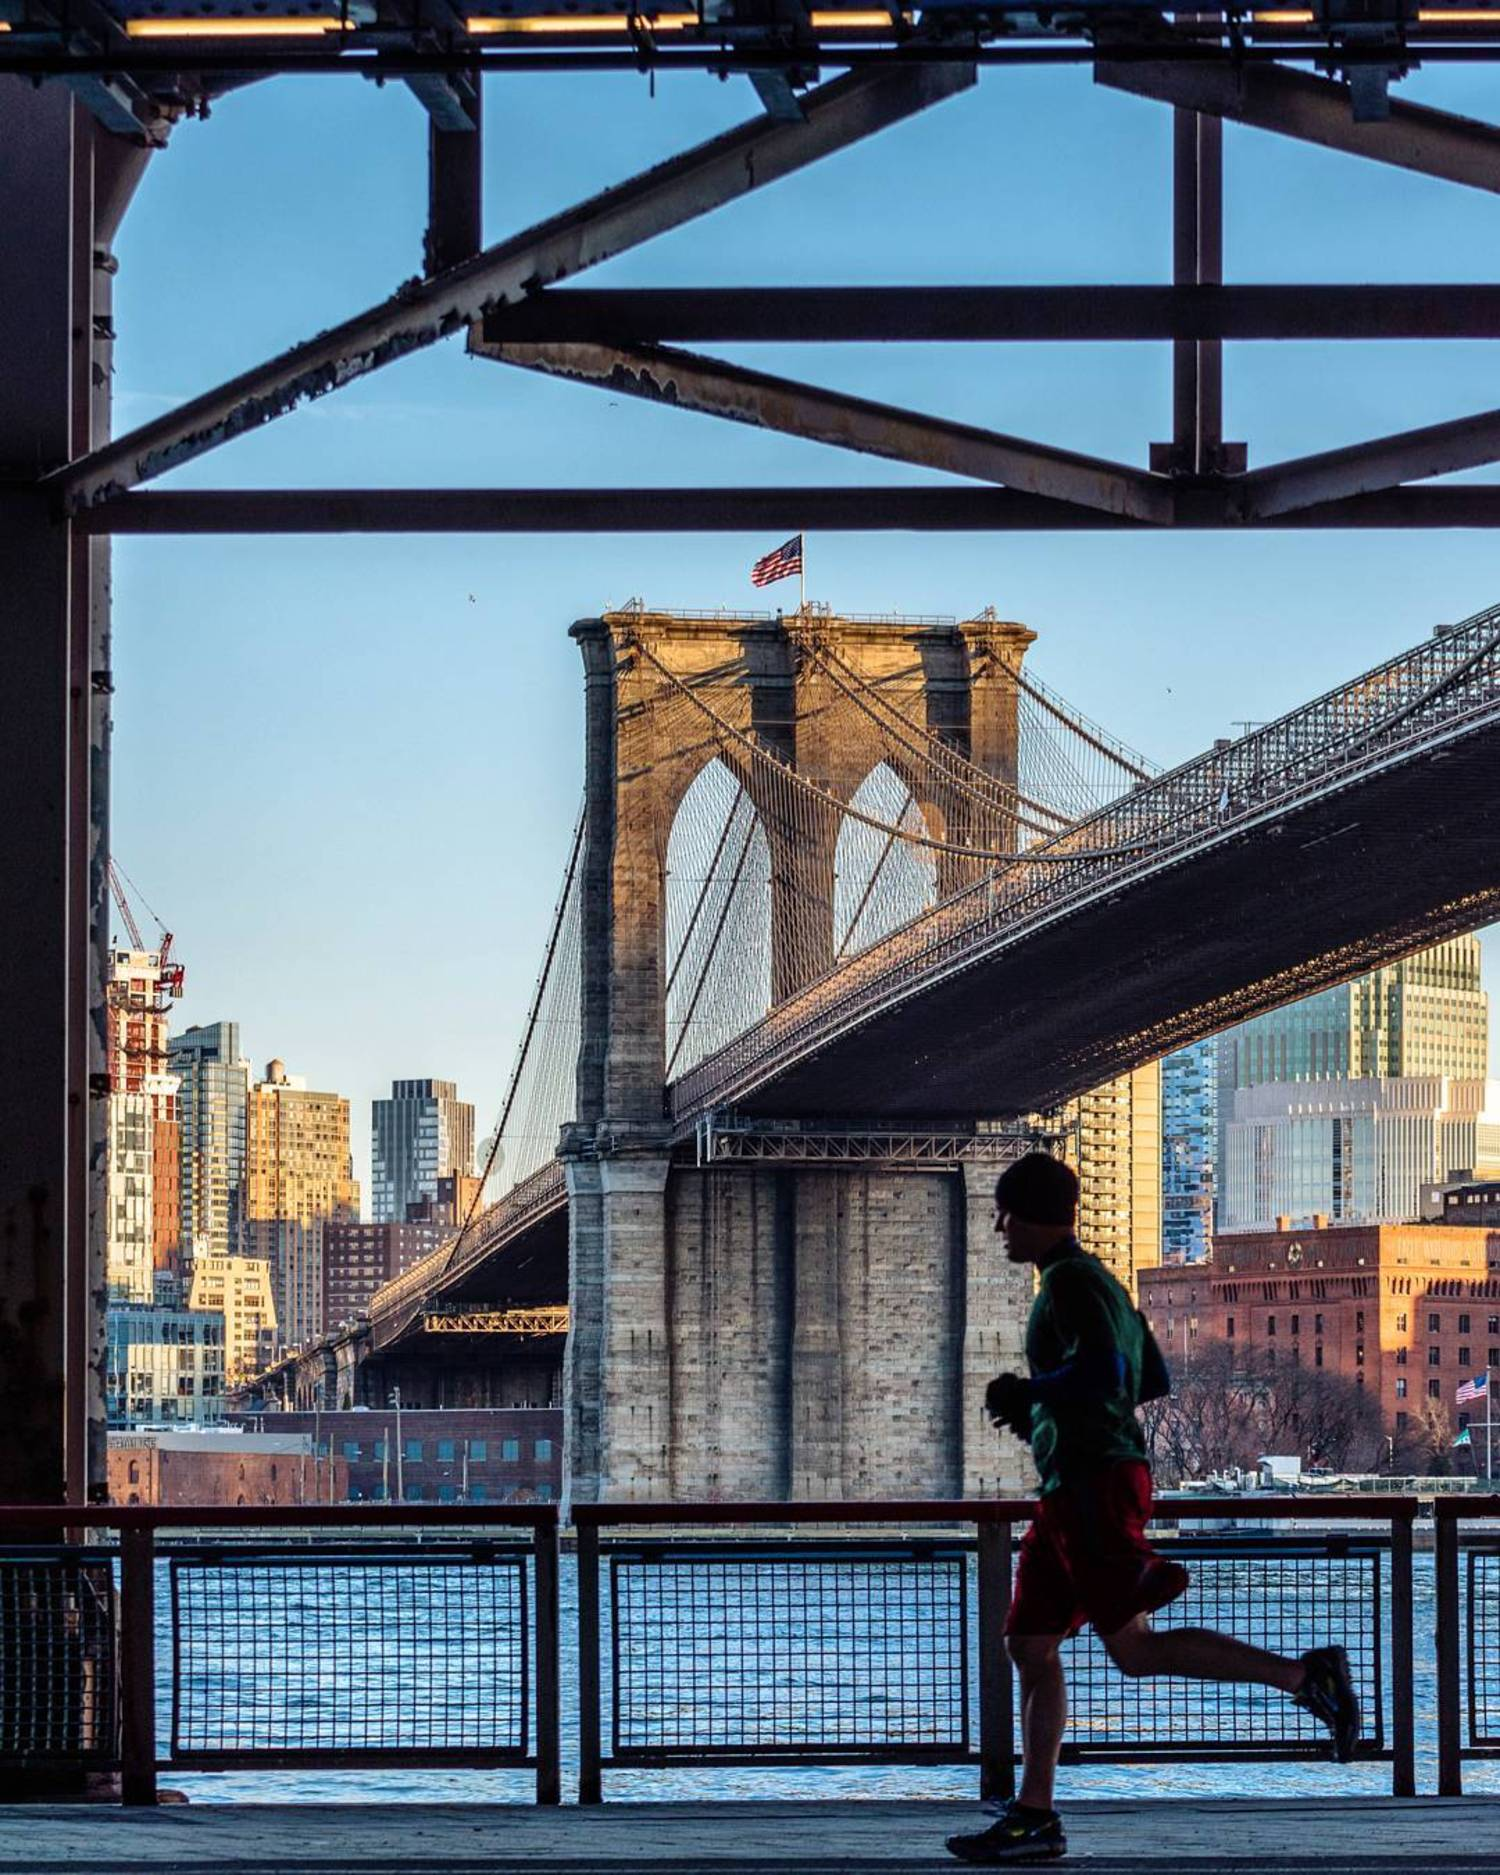 First day in NYC 🗽 Running at Brooklyn Bridge 🌉 #NewYork